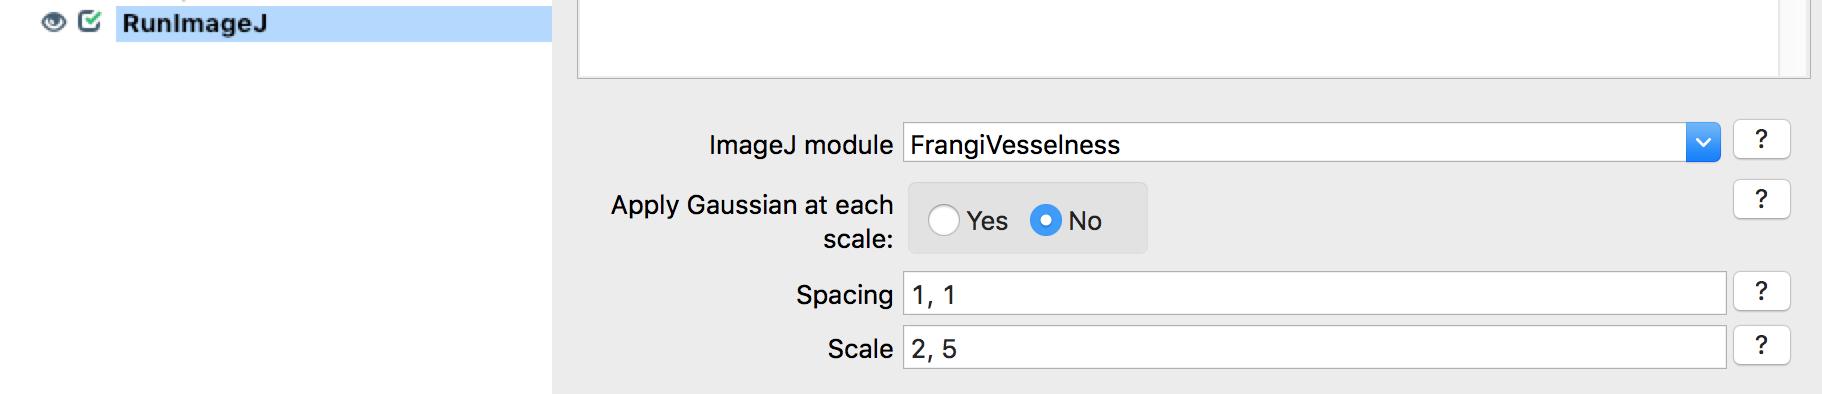 Explore using ImageJ's REST server for updated ImageJ